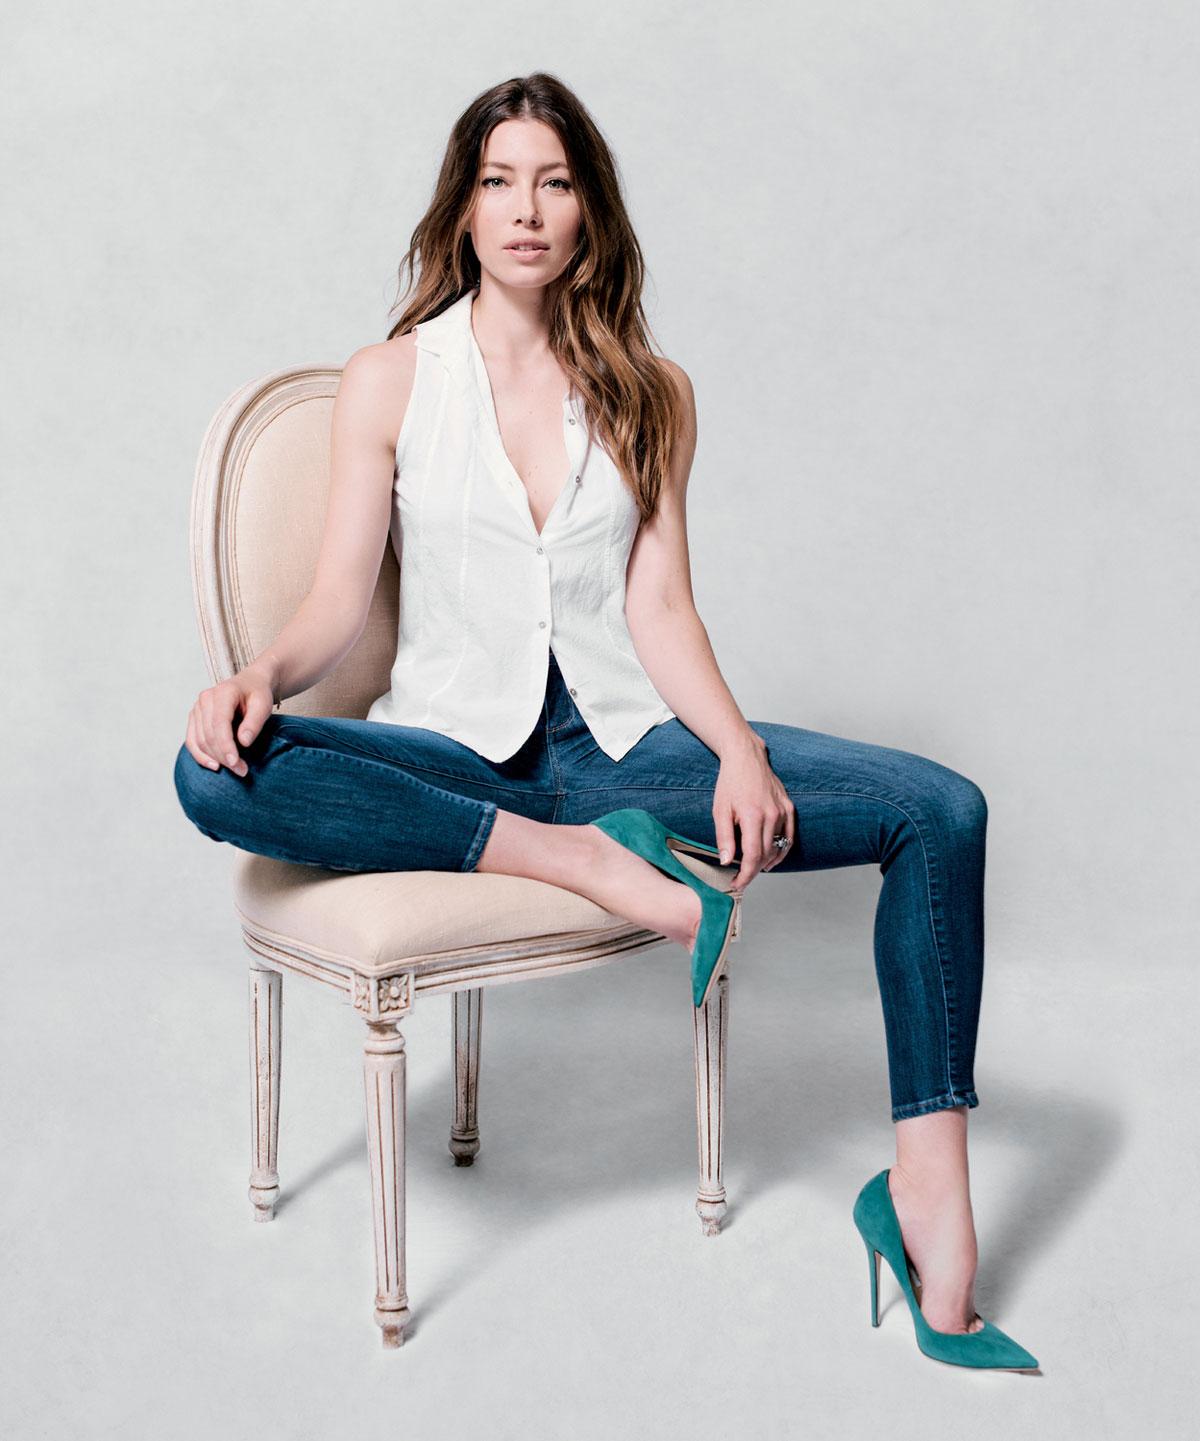 Jessica Biel dating 2014